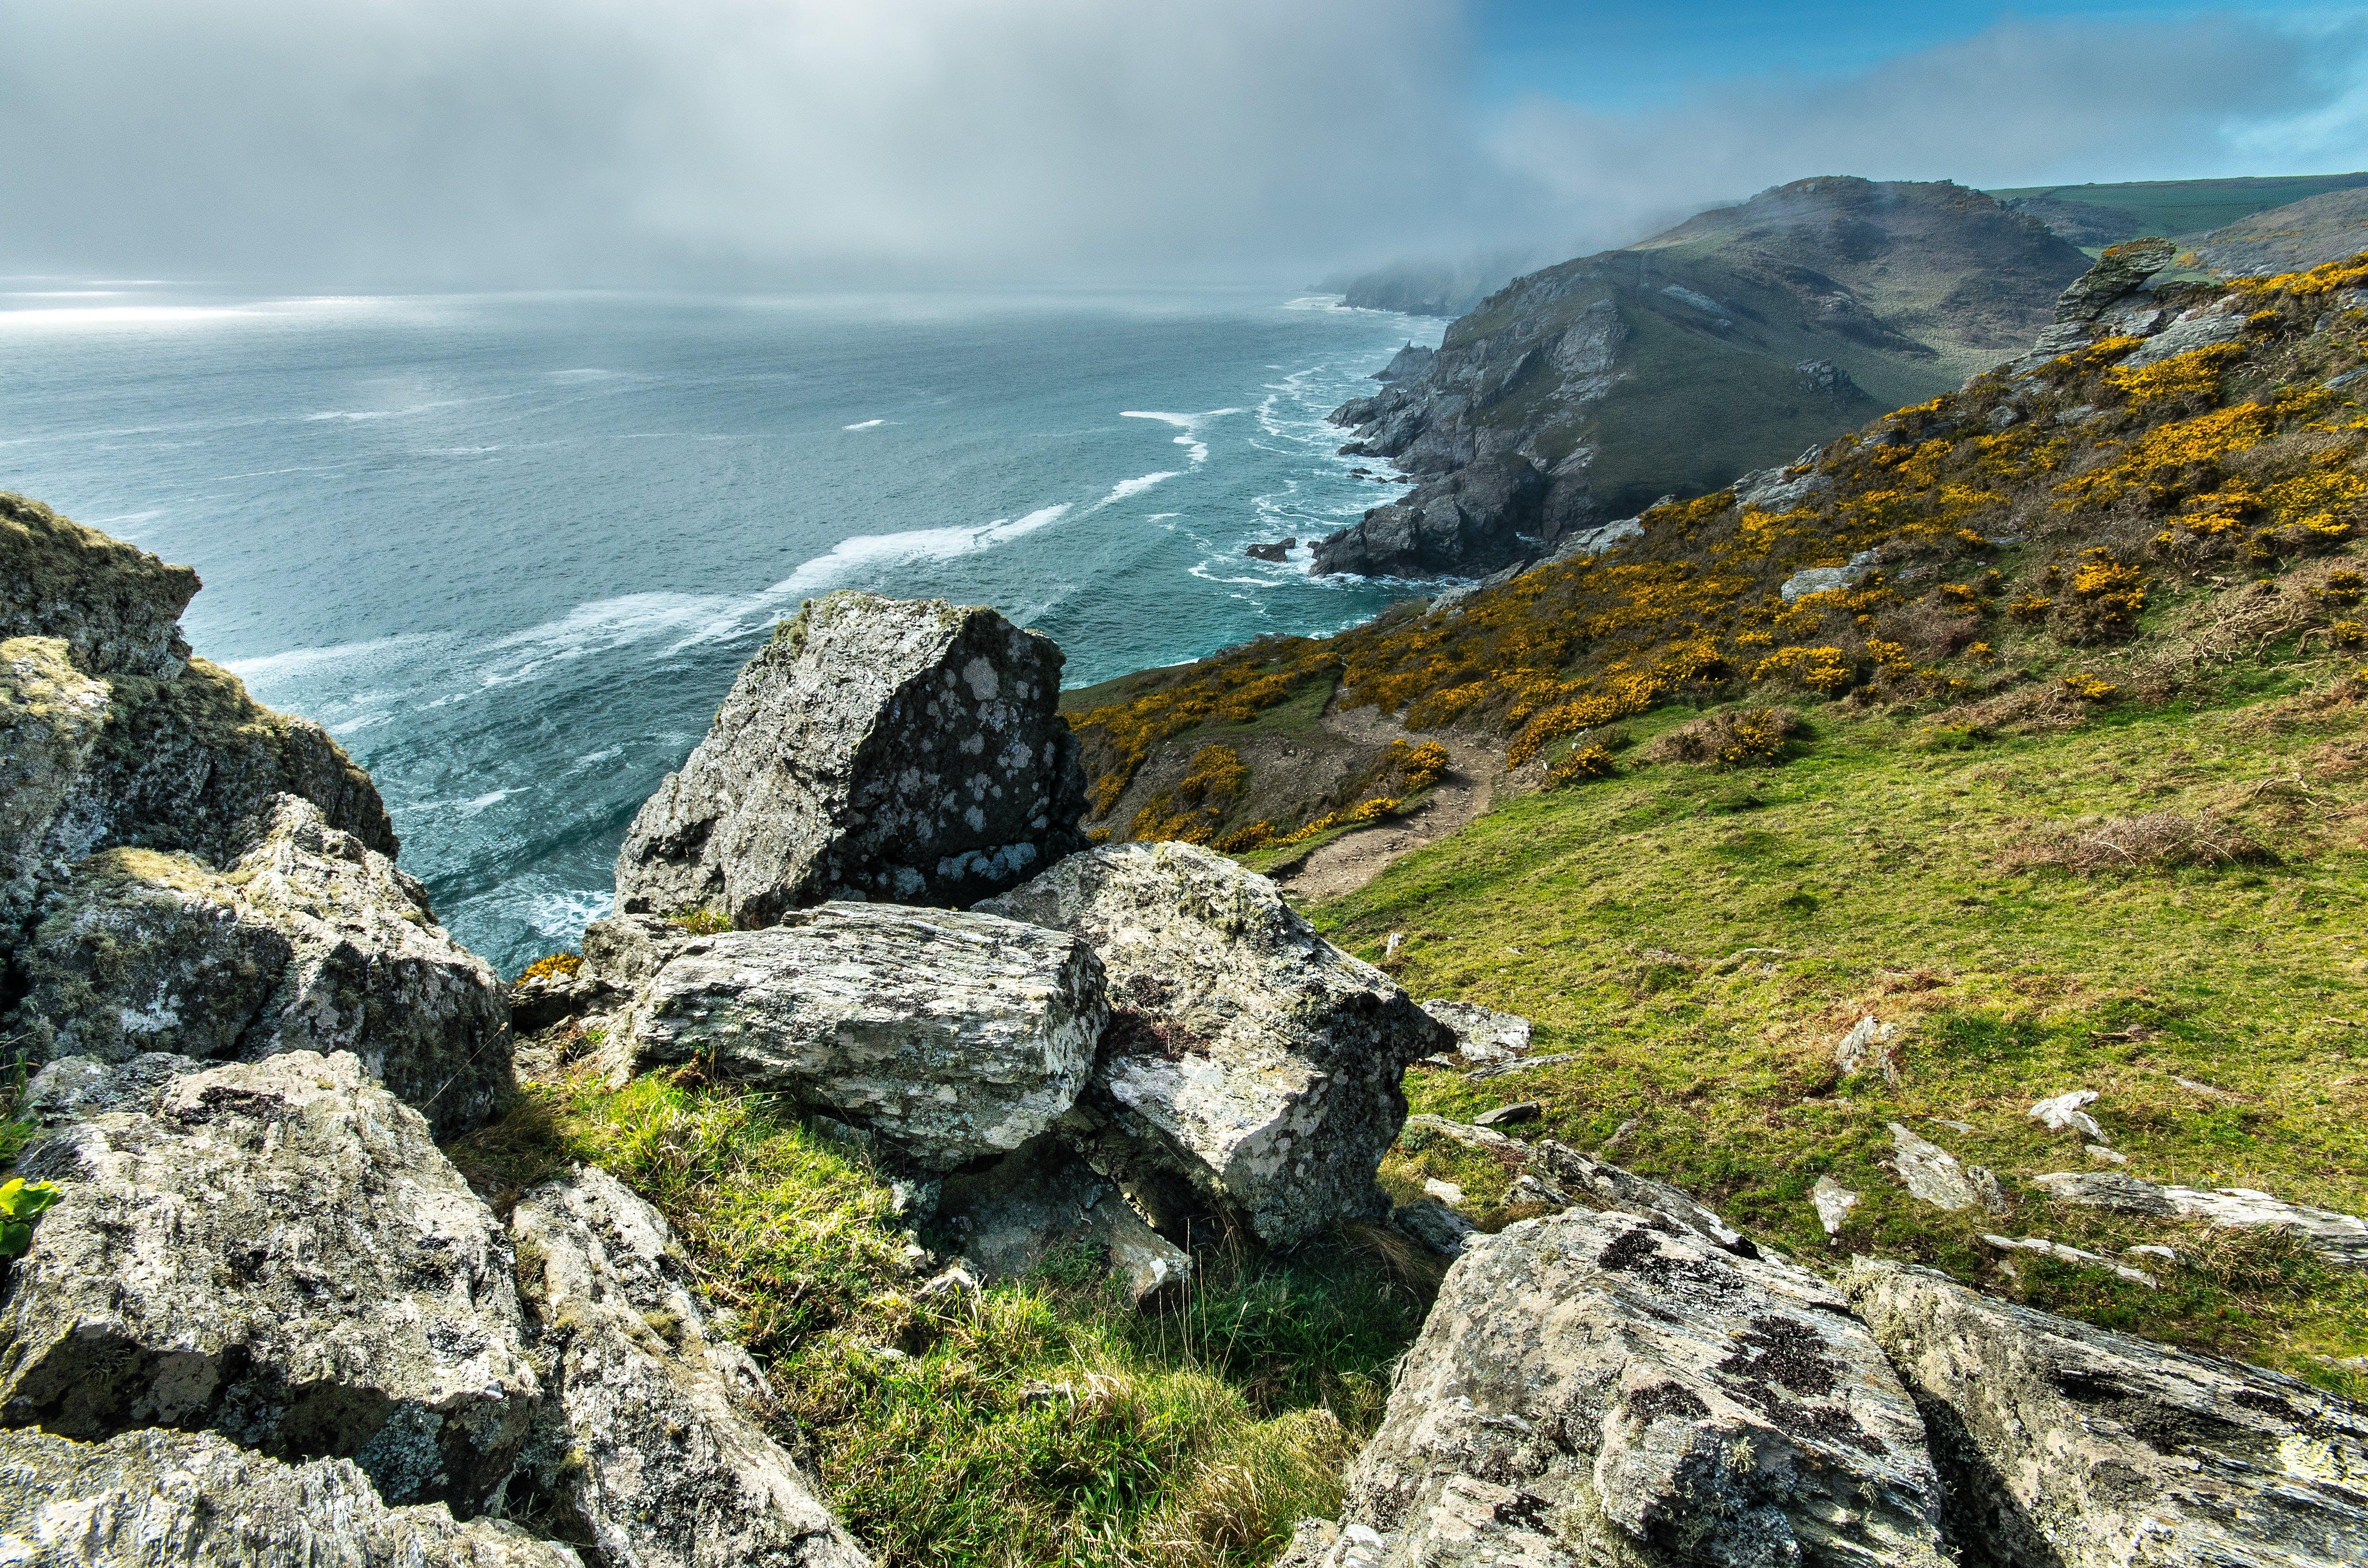 Landscape Photography of Mountain Beside Beach Shoreline